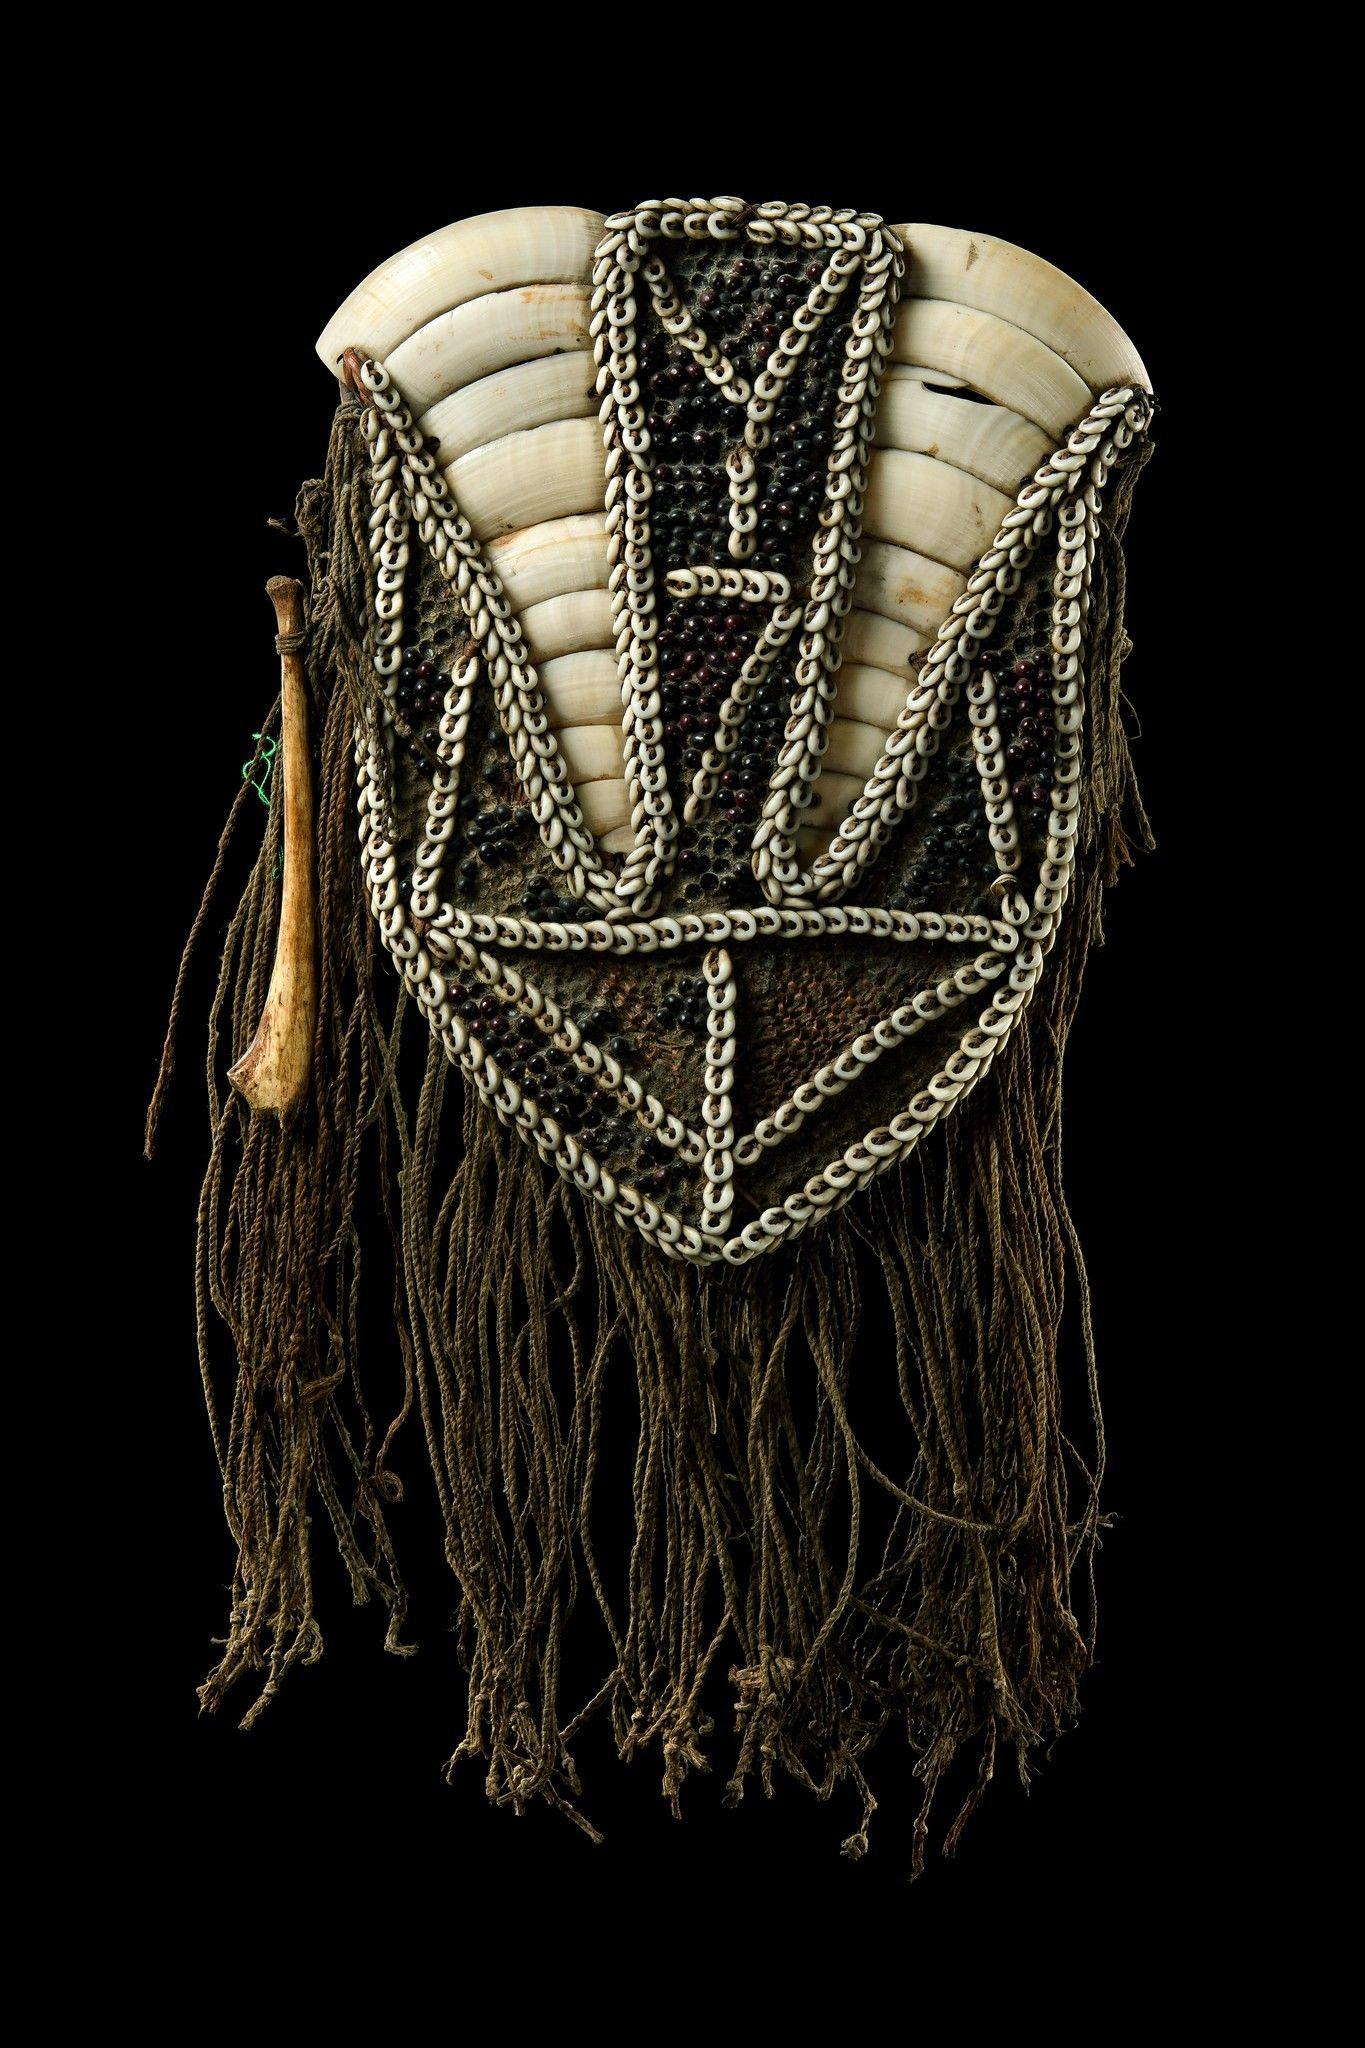 Breast ornament - Papua New Guinea